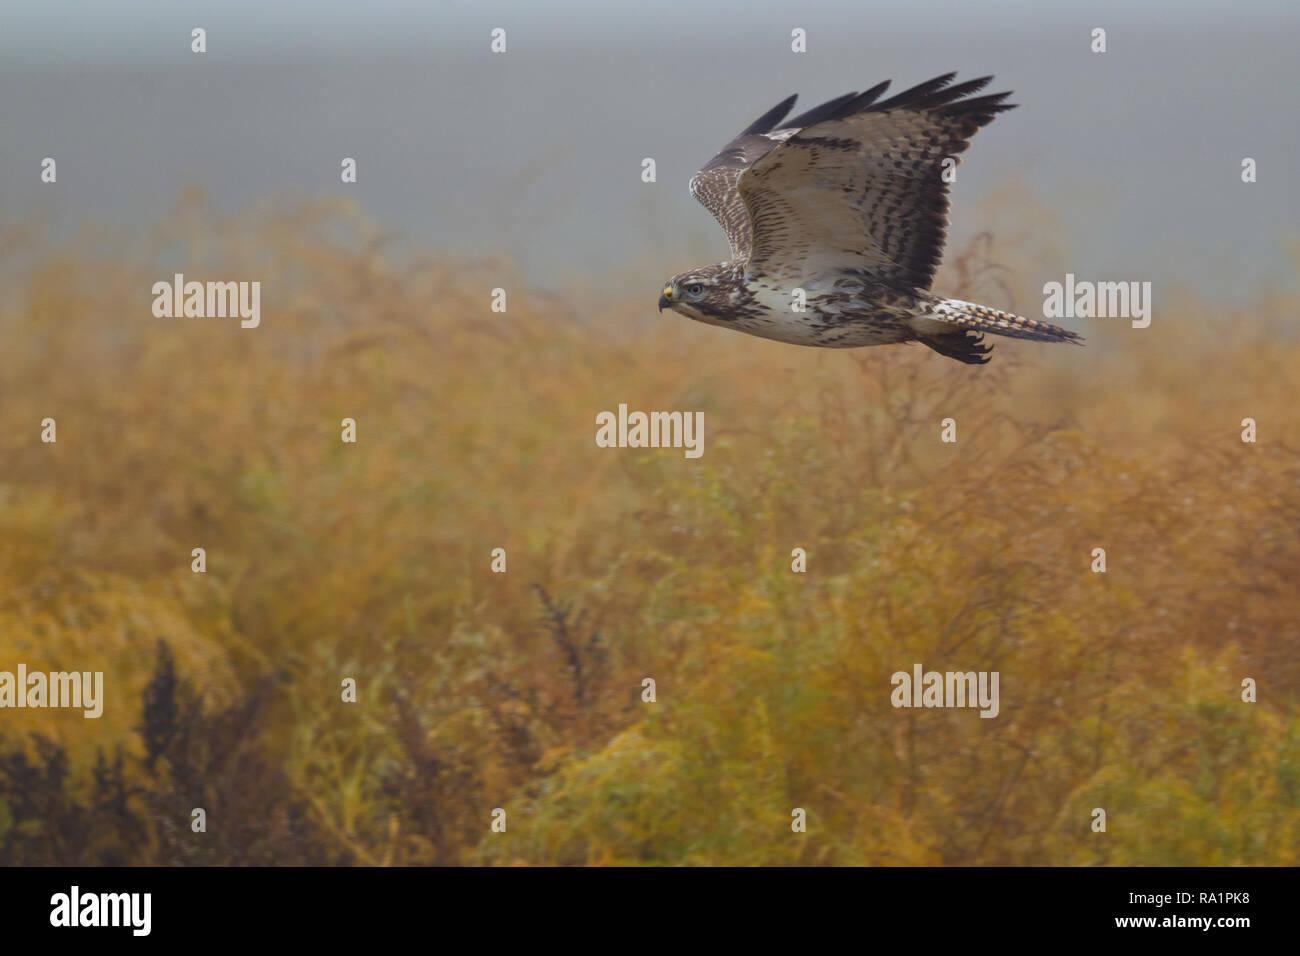 Common Buzzard (Buteo buteo) flying, Hesse, Germany - Stock Image